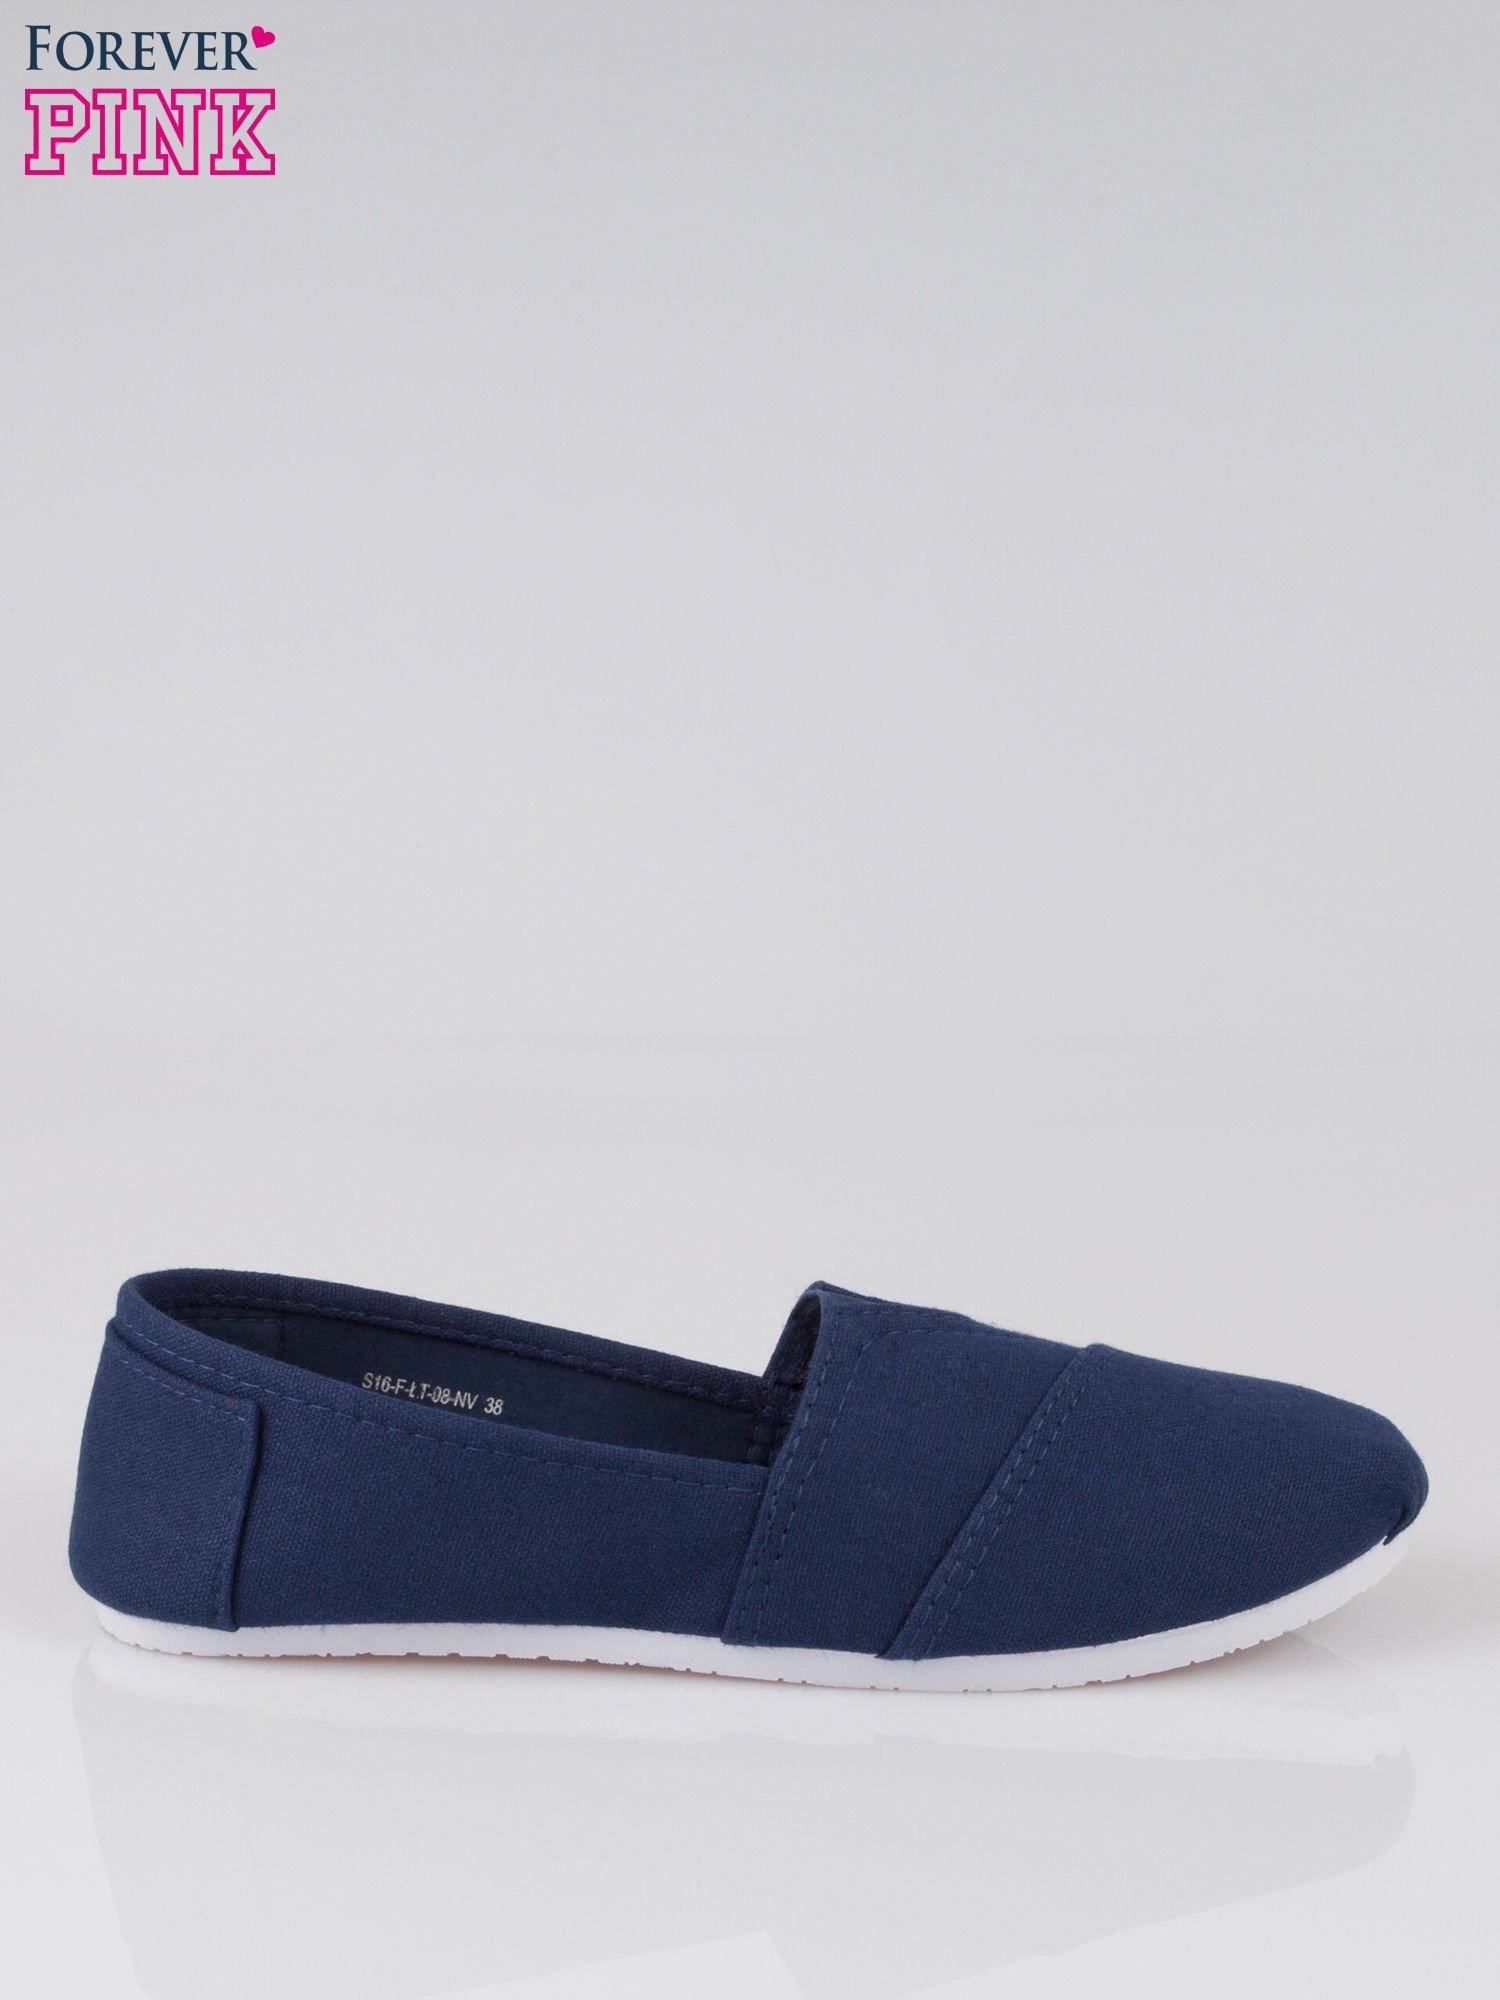 Granatowe lekkie buty slip on                                  zdj.                                  1